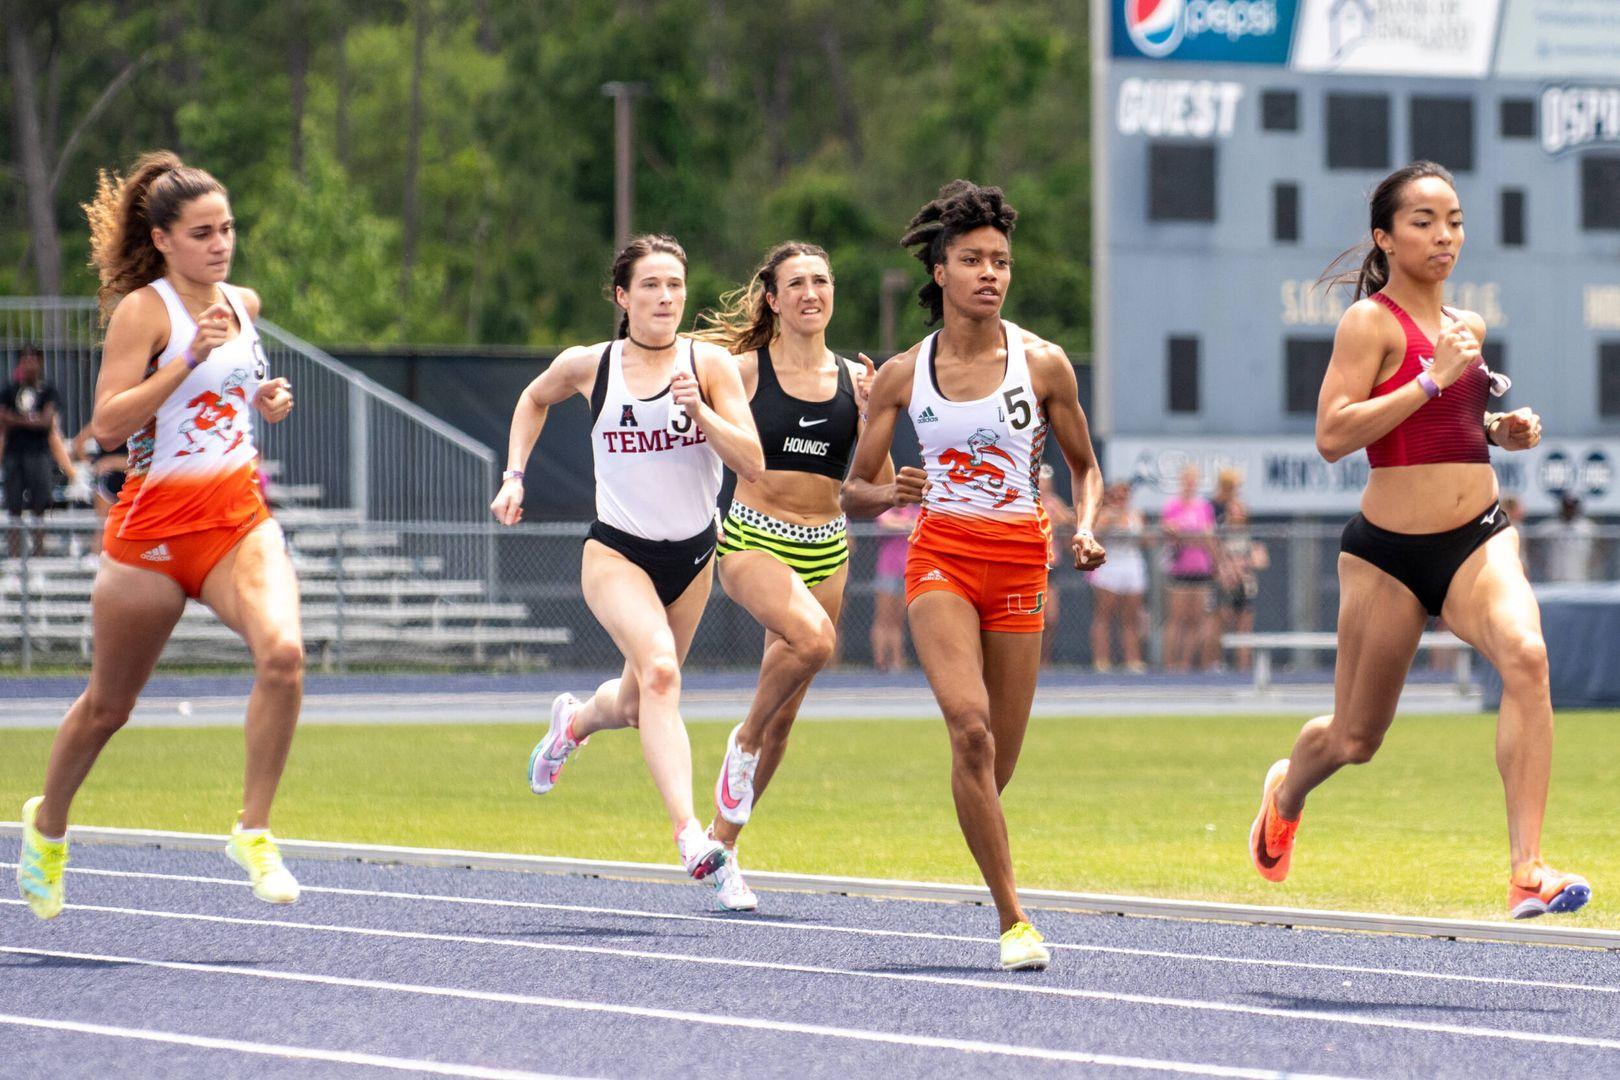 Johnson Breaks Previous 800m Program Record